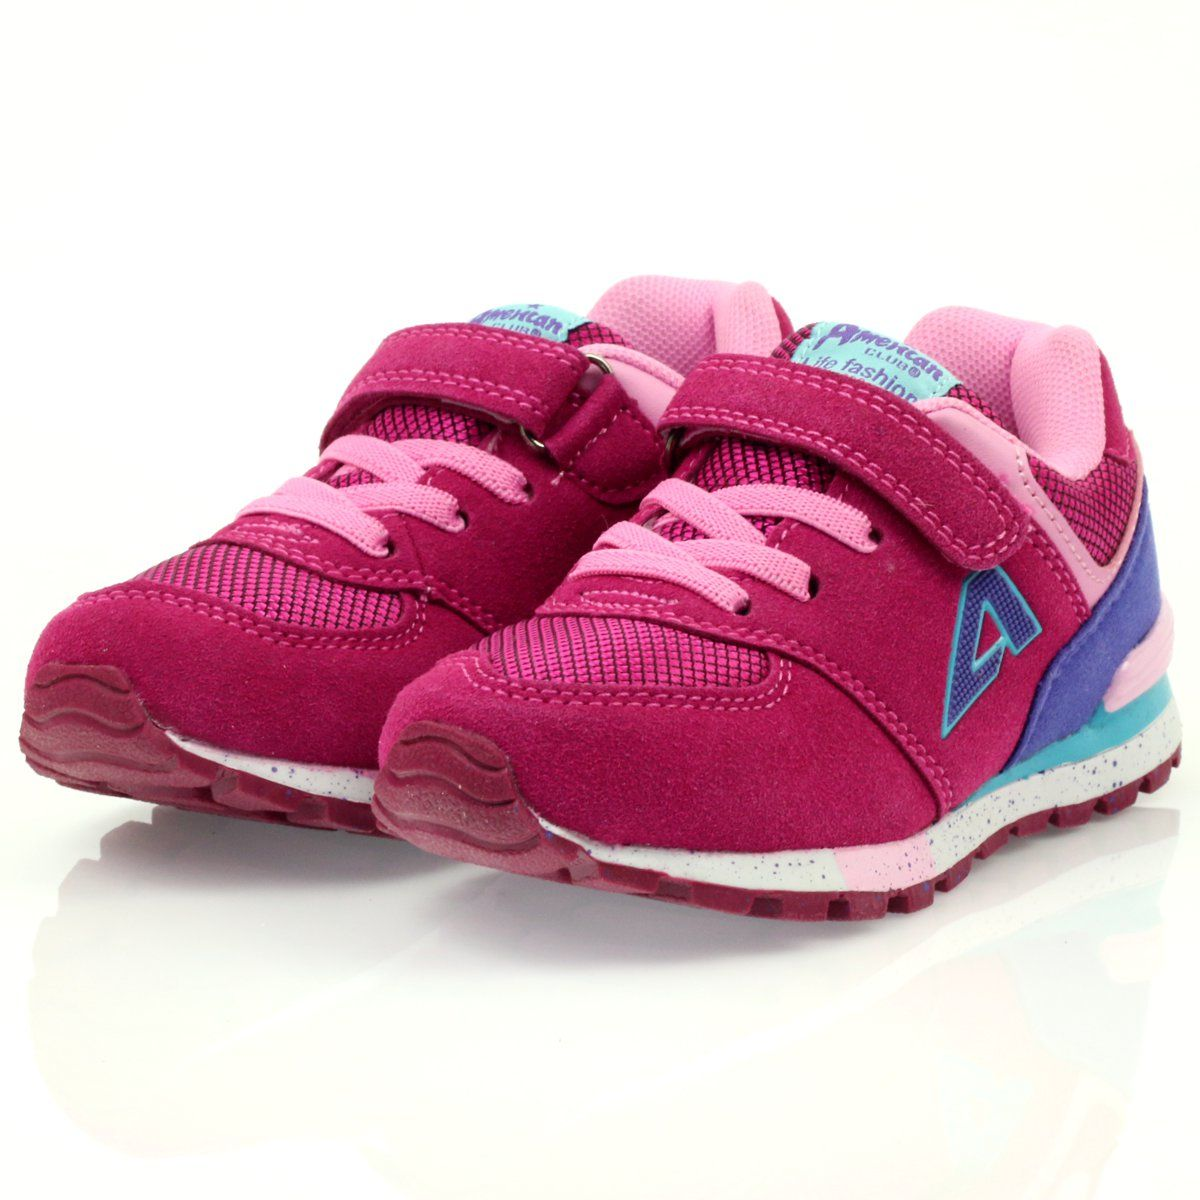 American Club American Adi Sportowe Buty Dzieciece 15110 Rozowe New Balance Sneaker Brooks Sneaker Sneakers